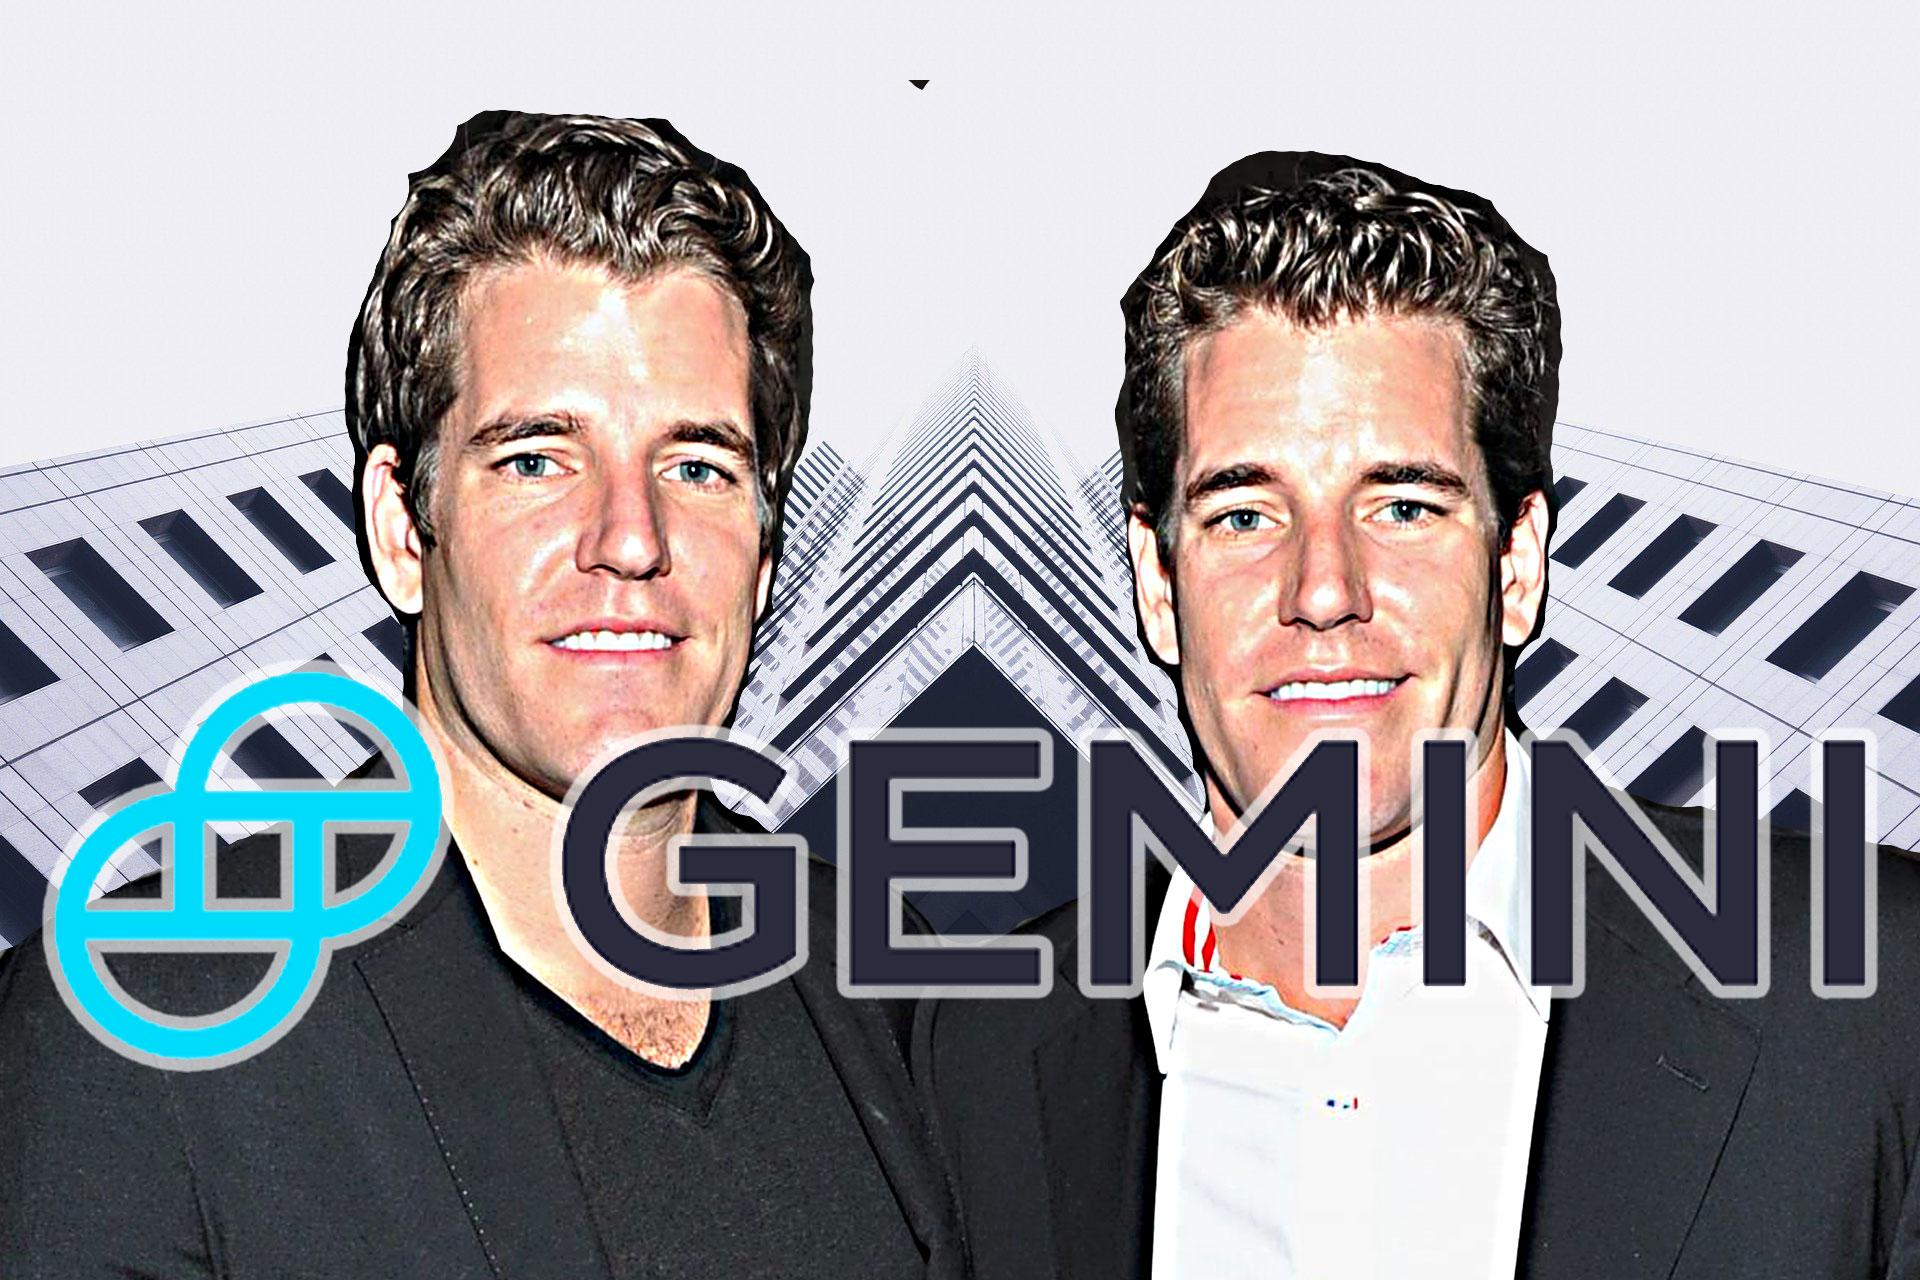 Geminiが2億ドル相当を保障する自社保険会社を設立!